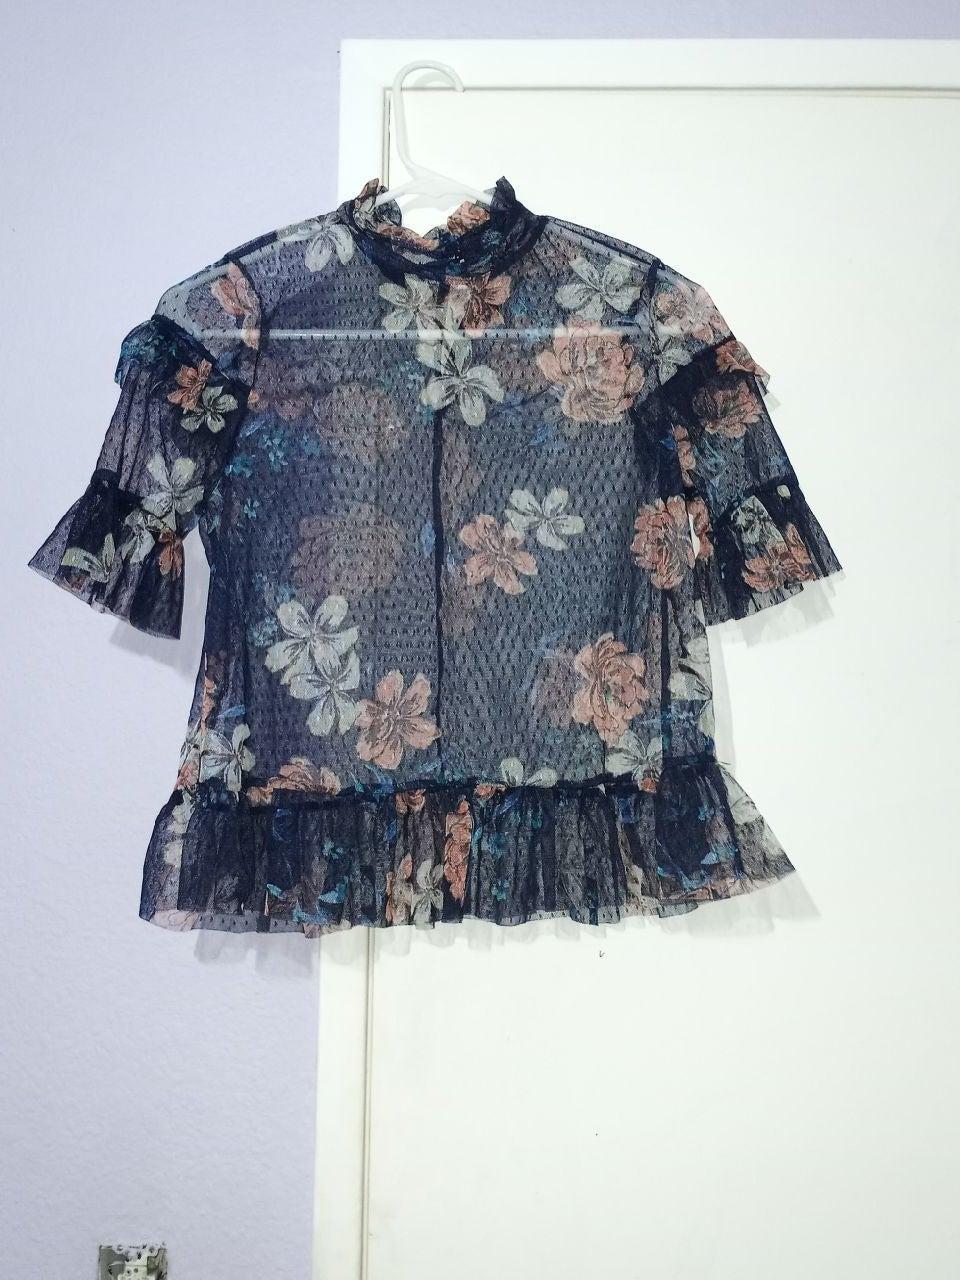 Haut monde shirt/blouse